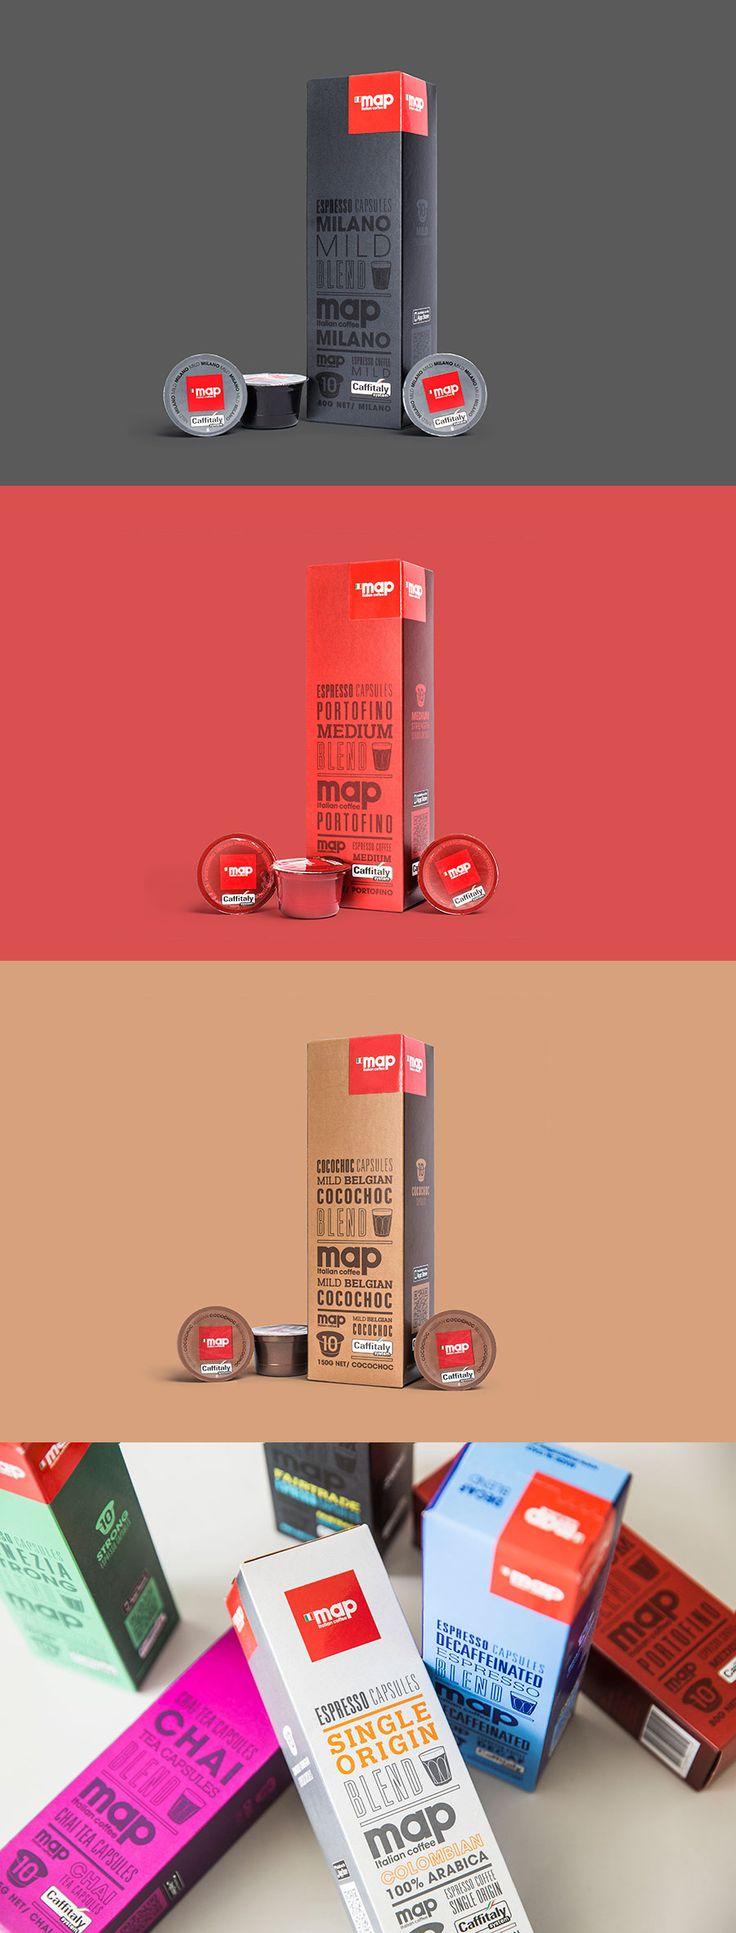 27 Beautiful Packaging Designs 16